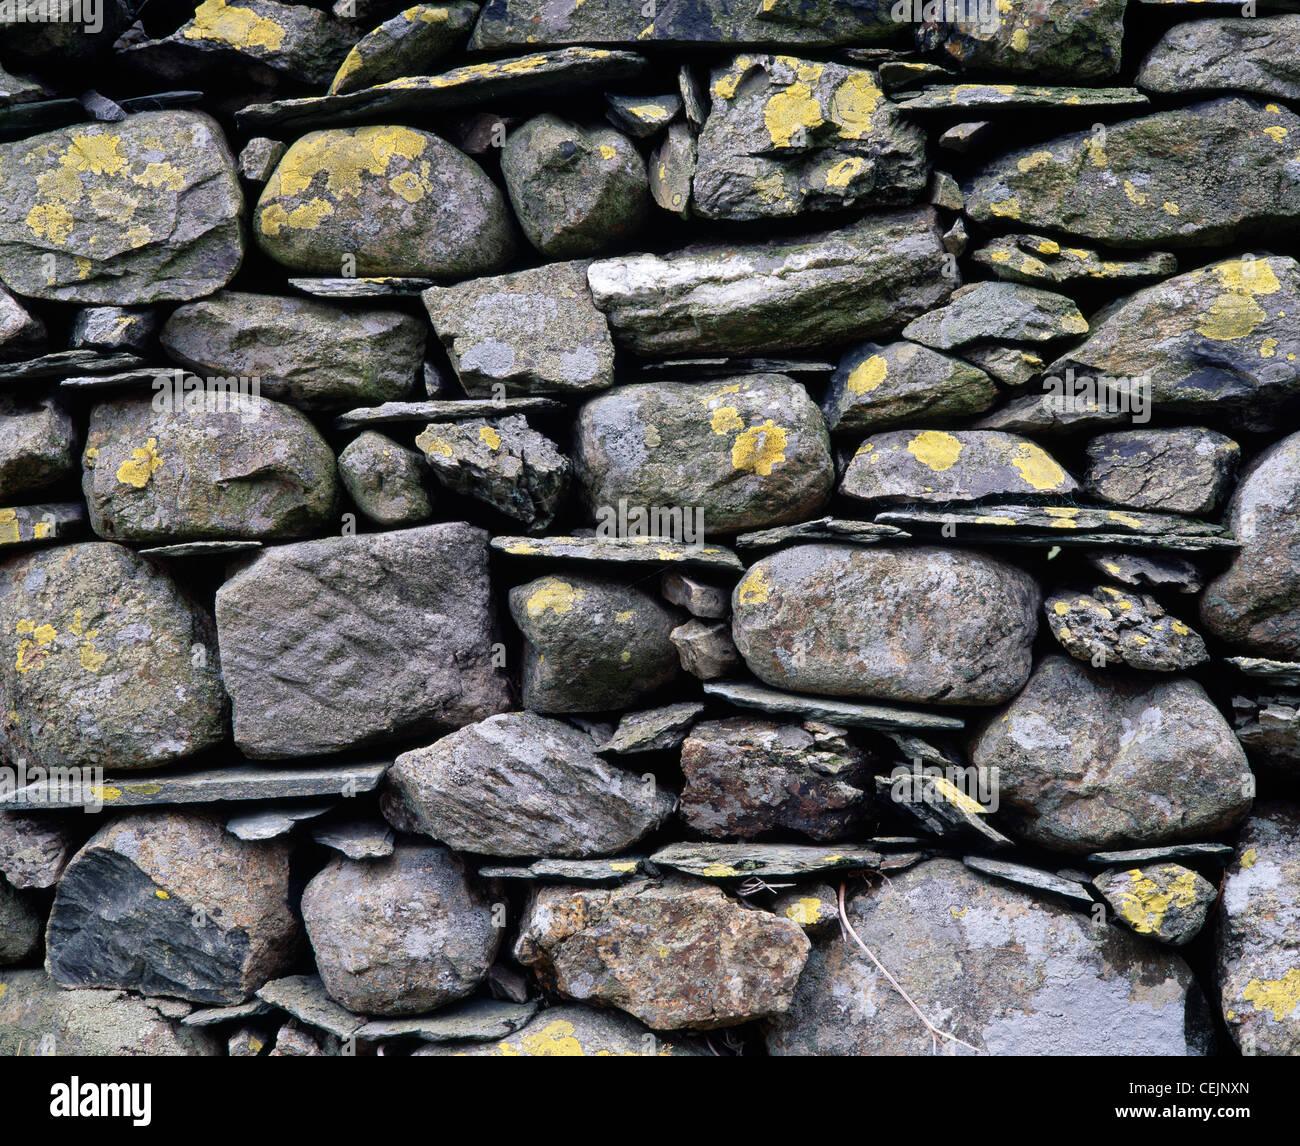 Trockenmauern Wand Nahaufnahme. Newlands Tal, Cumbria, England, UK. In den Lake District National Park. Stockbild